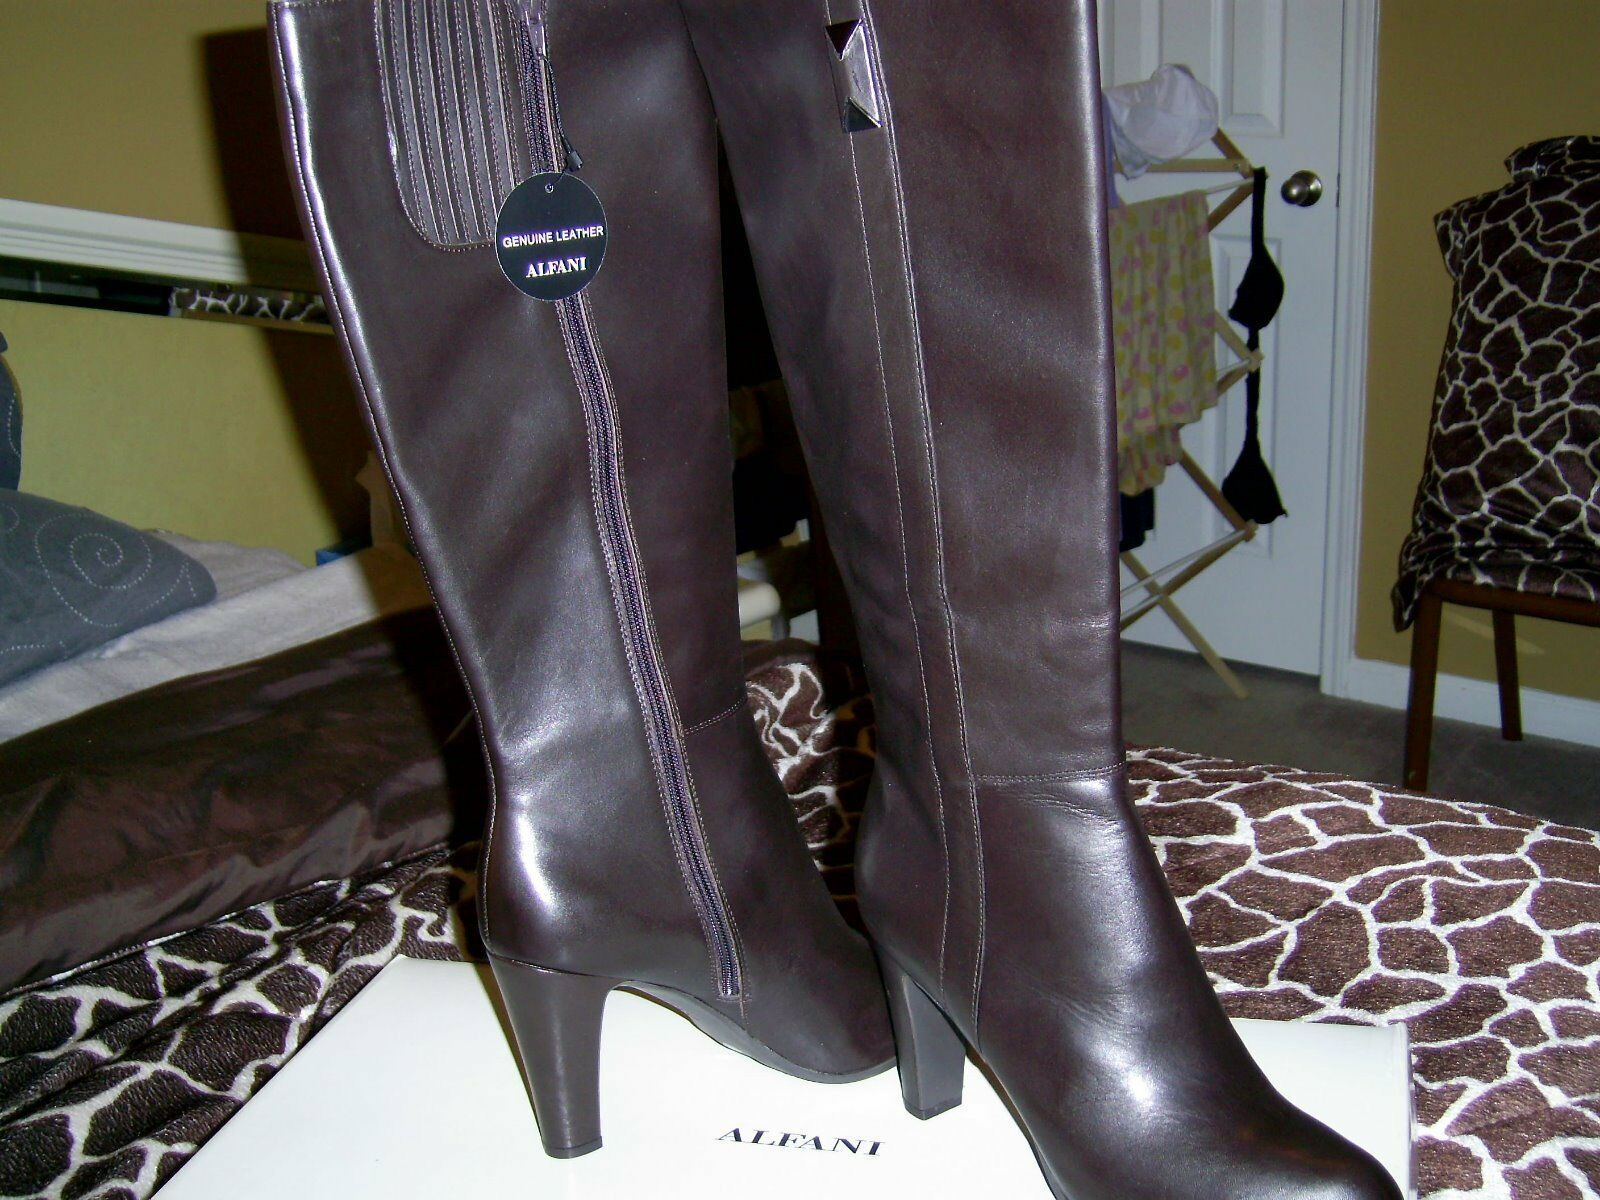 Alfani Women's Leather Boots Size 10M